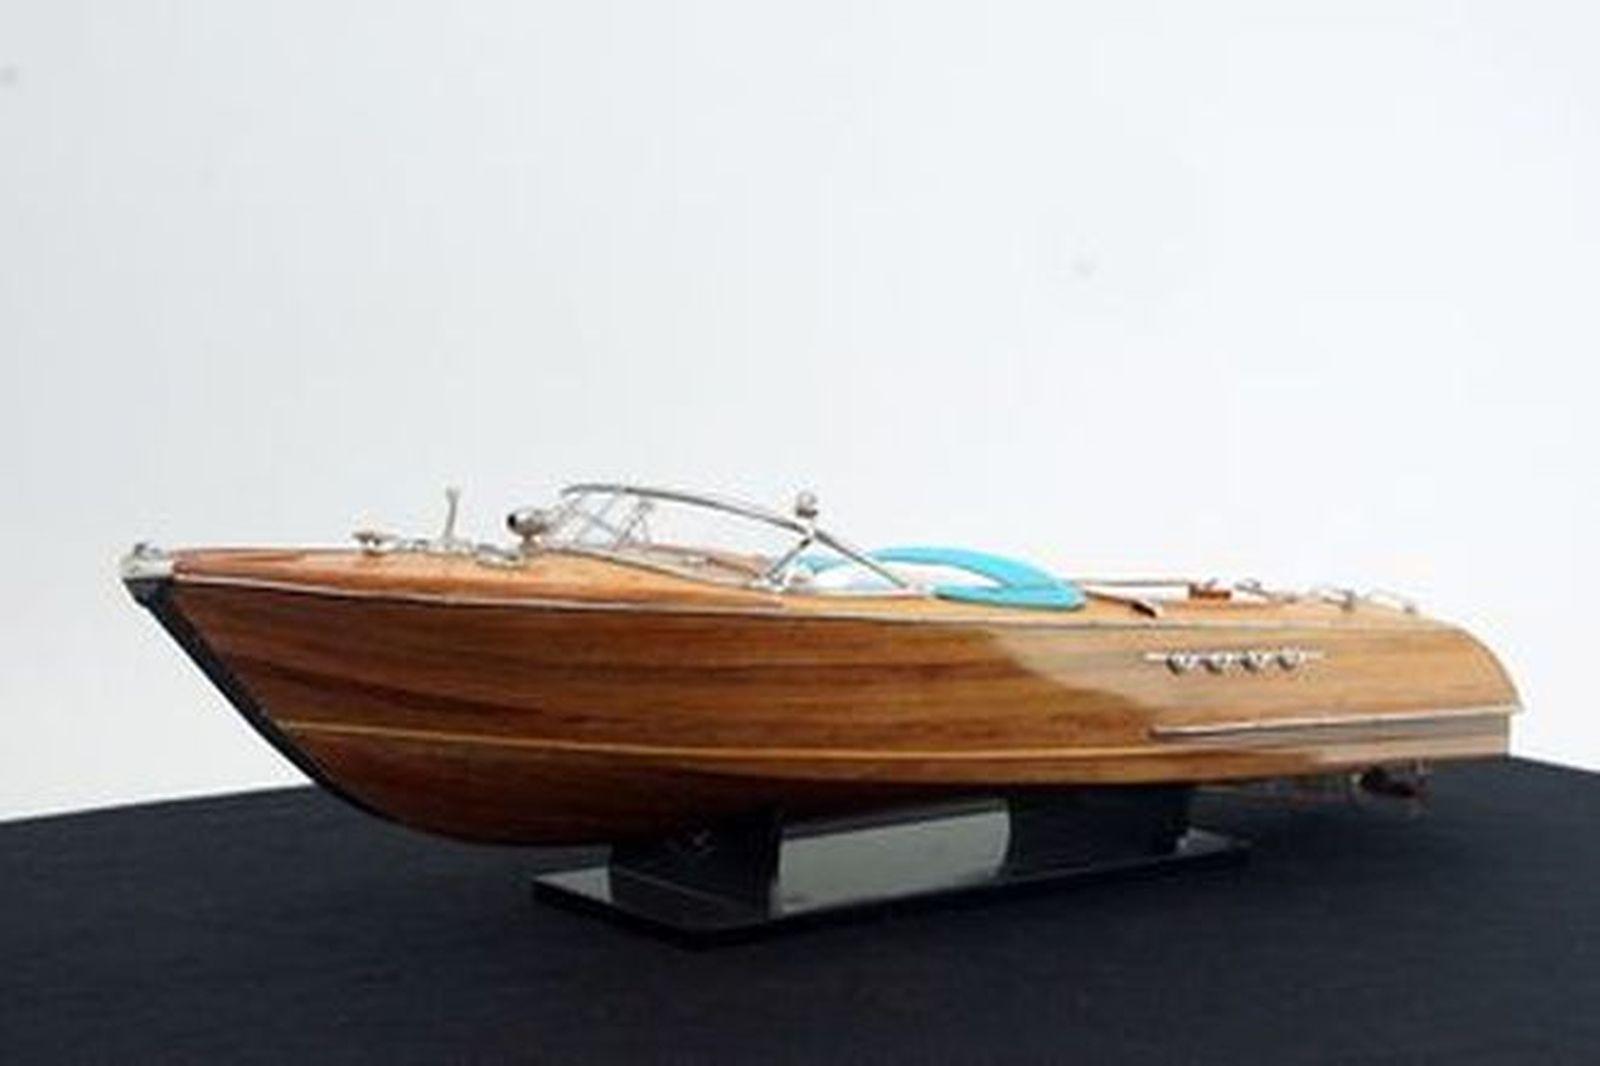 Model Boat - Aquarama Riva (Size - 86cm long)